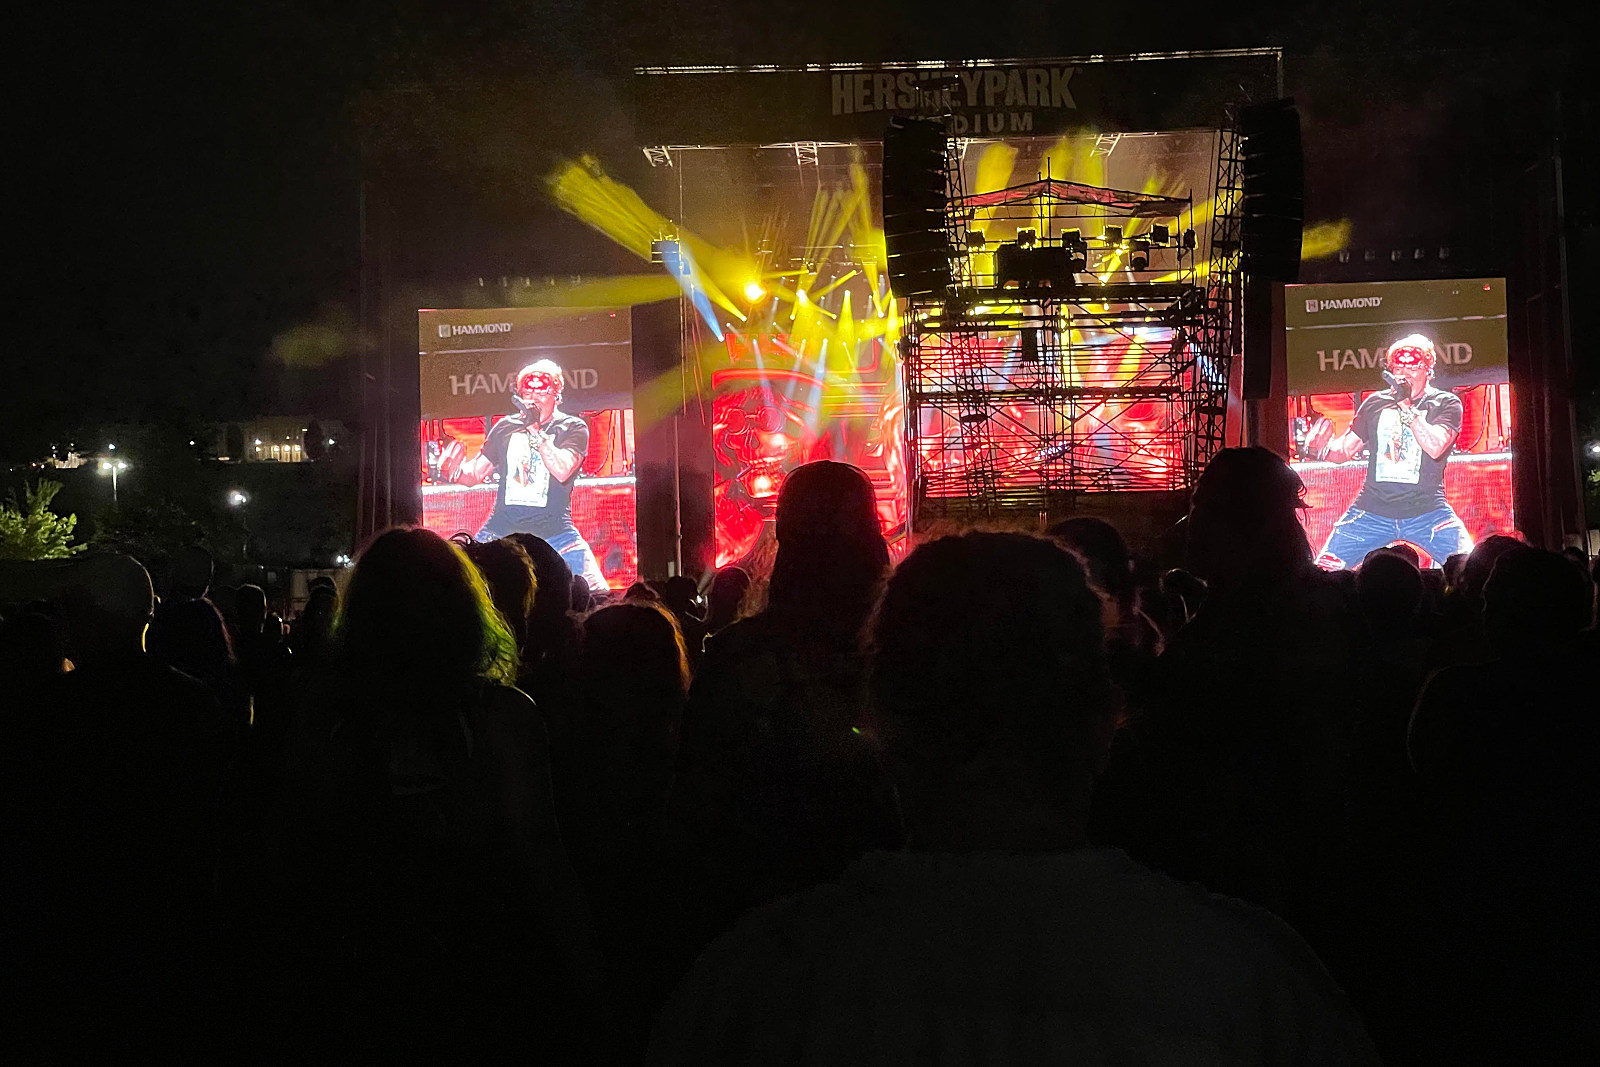 Guns N' Roses, Mammoth WVH Kick Off Summer Tour: Videos, Set List